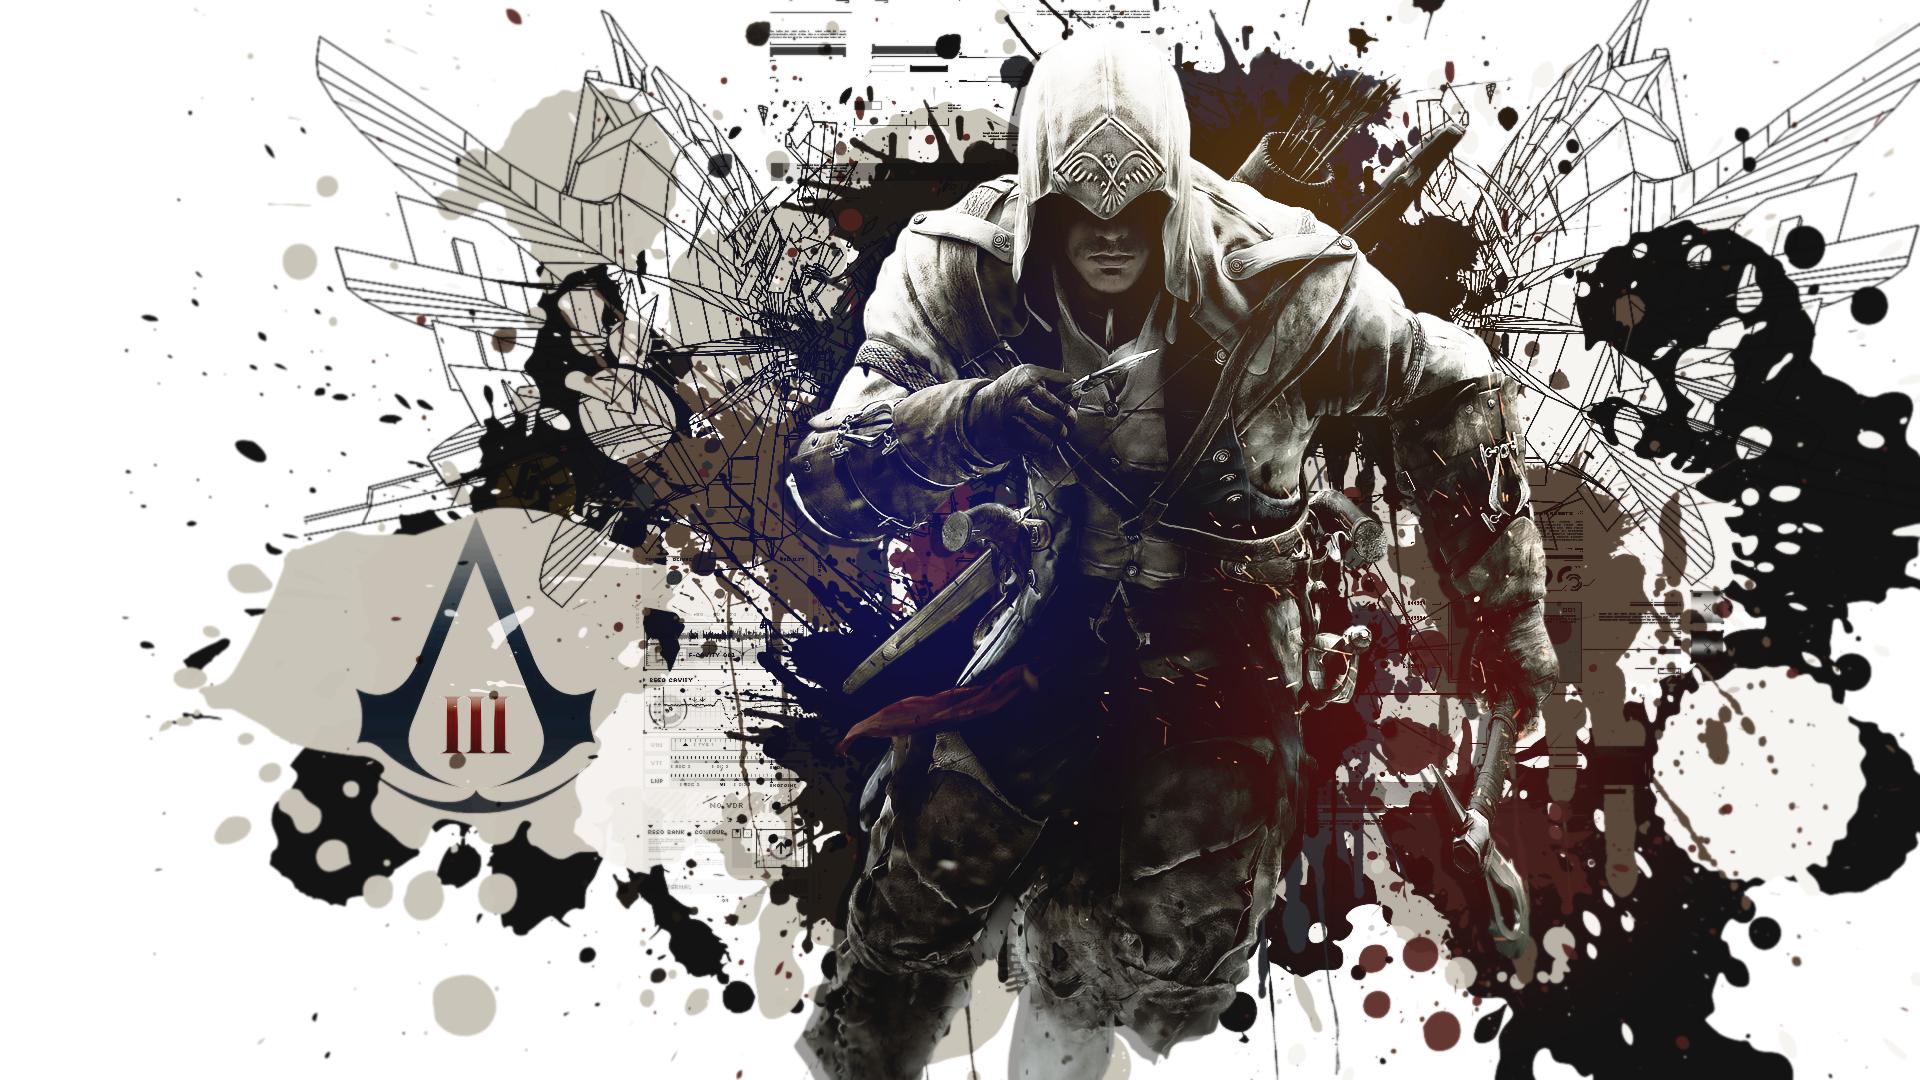 Assassins Creed 3 Wallpaper Hd 1080P 1340750 1920x1080